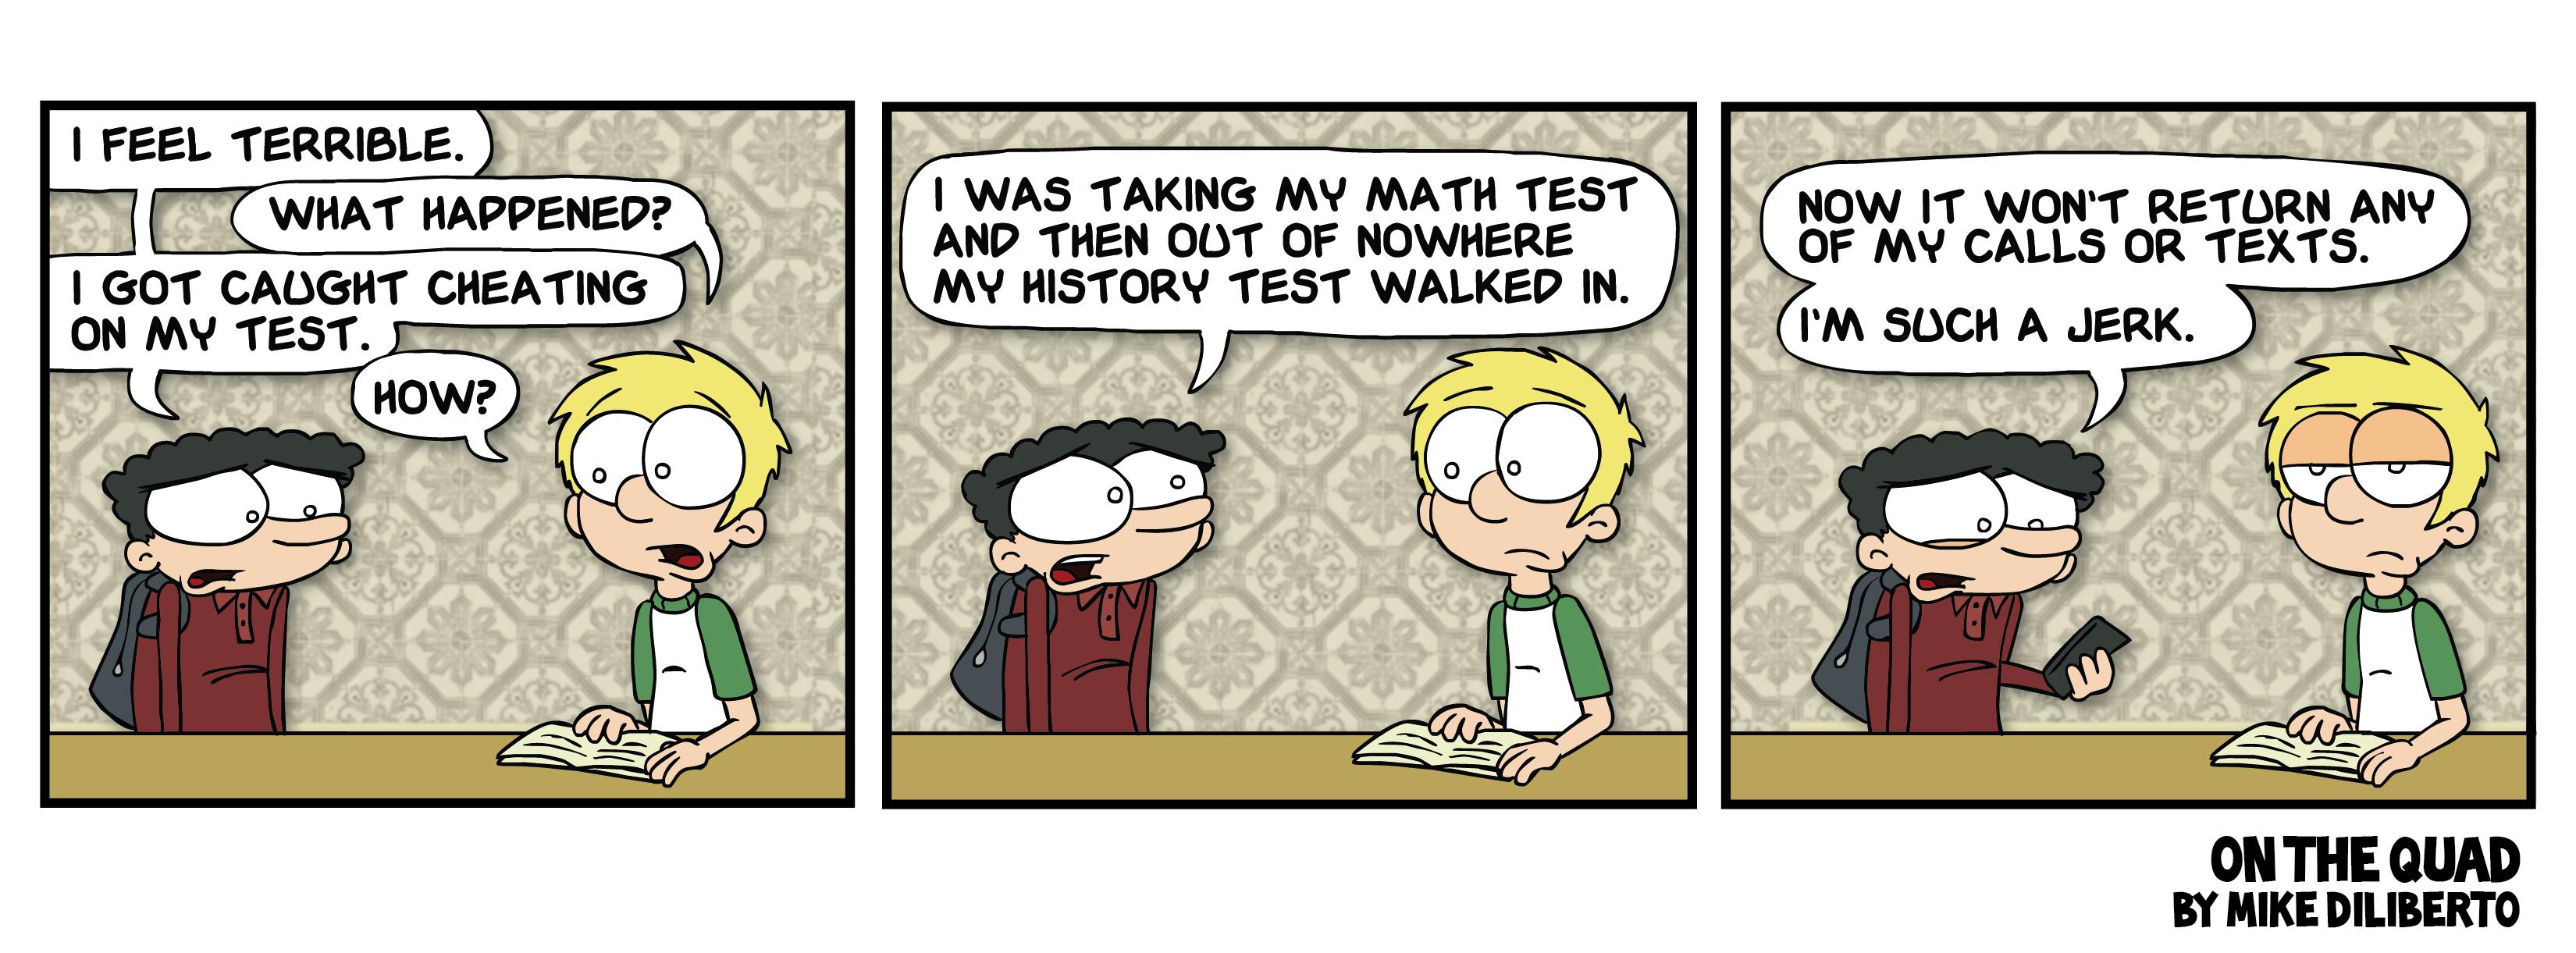 Test Cheating